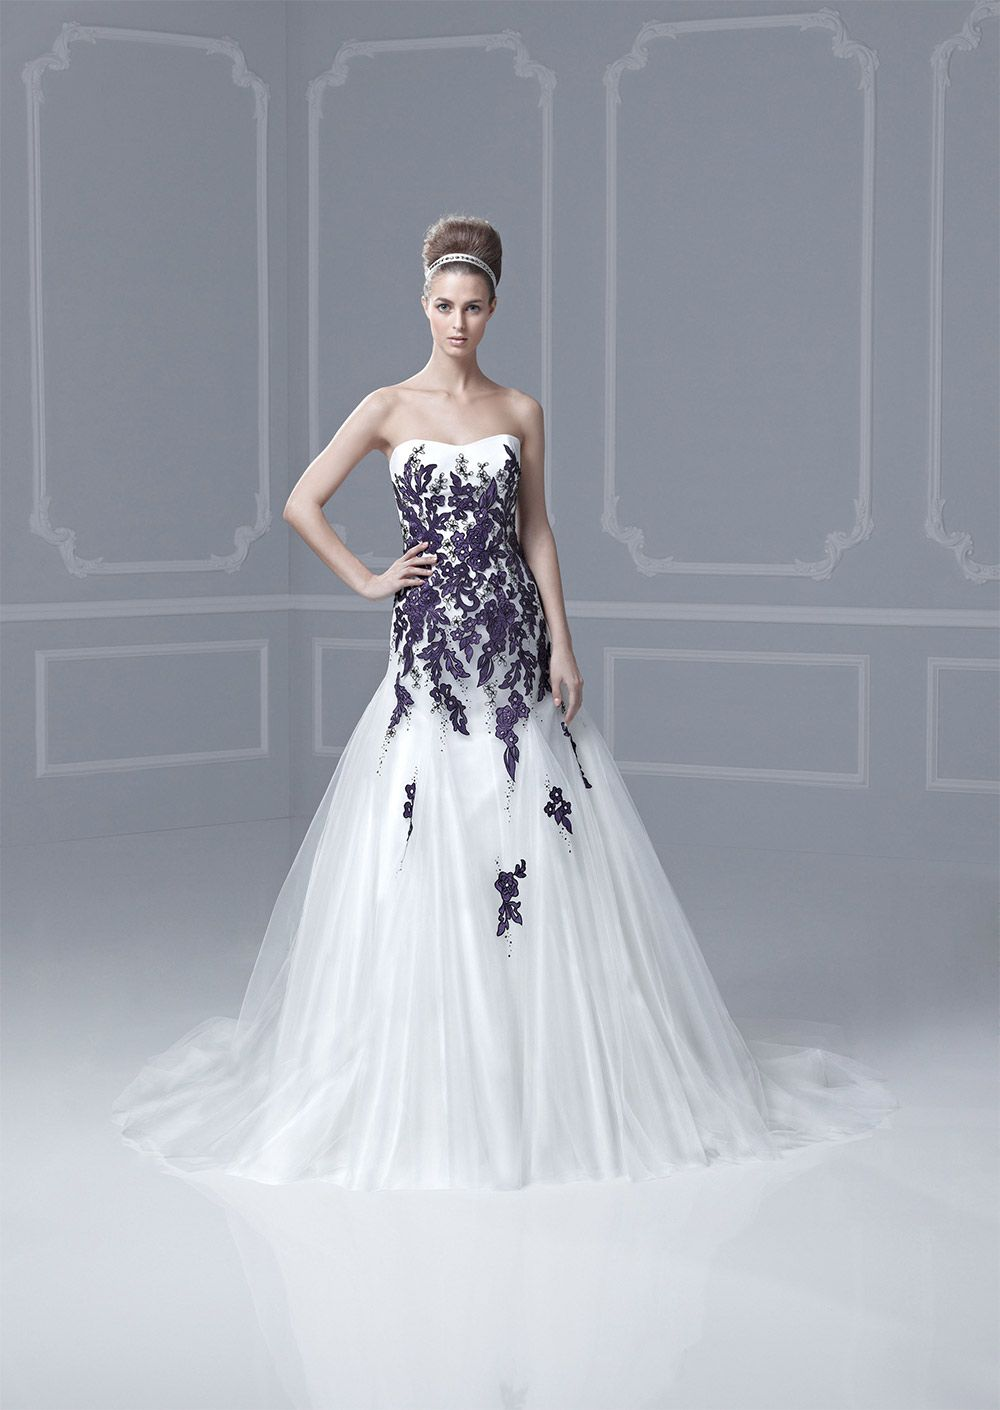 Gothic Wedding Dresses: 15 Dramatic Gowns | Wedding dress, Gothic ...